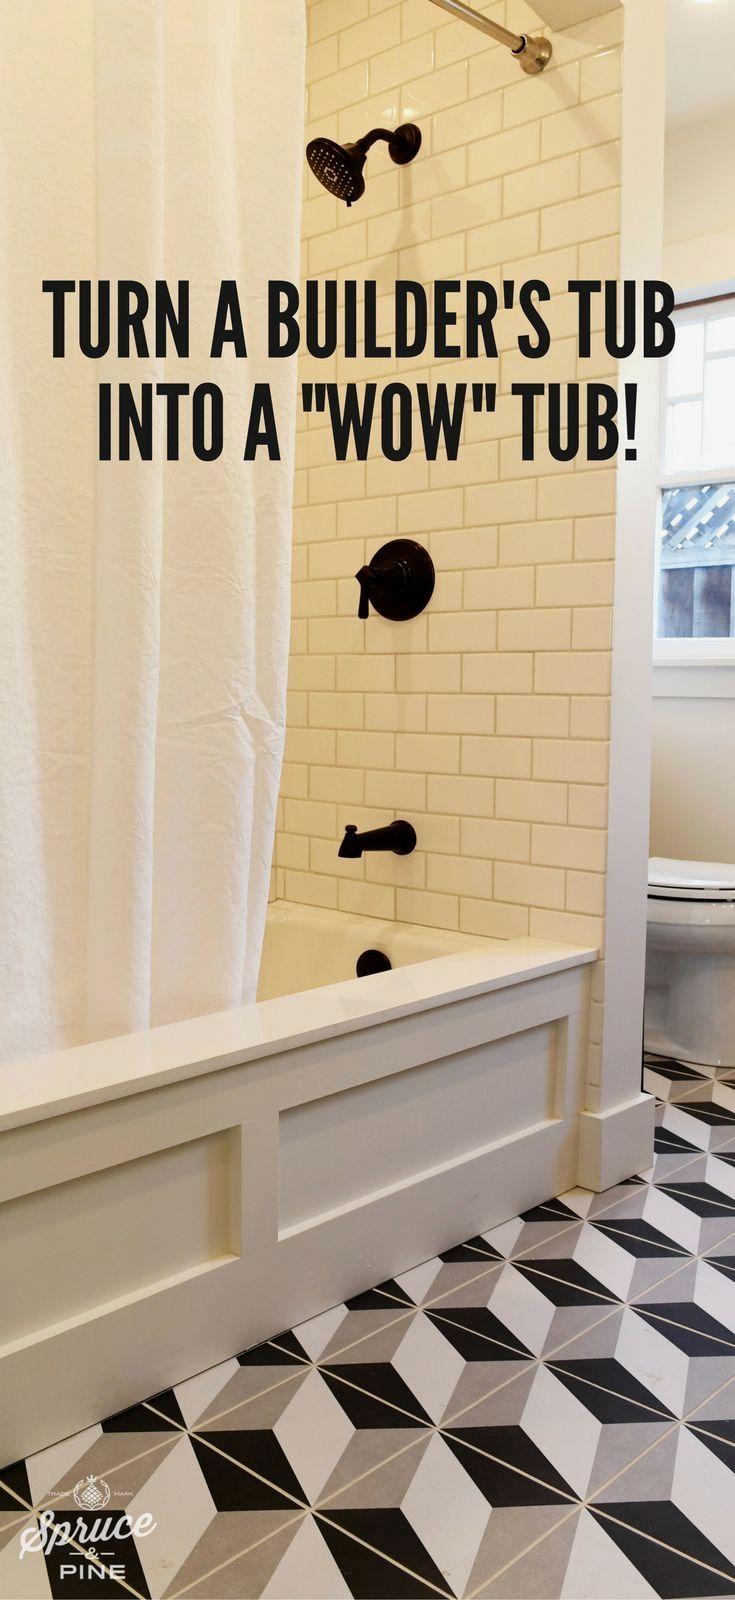 New Diy Bathroom Ideas Home Improvement Projects Diy Home Improvement Home Diy